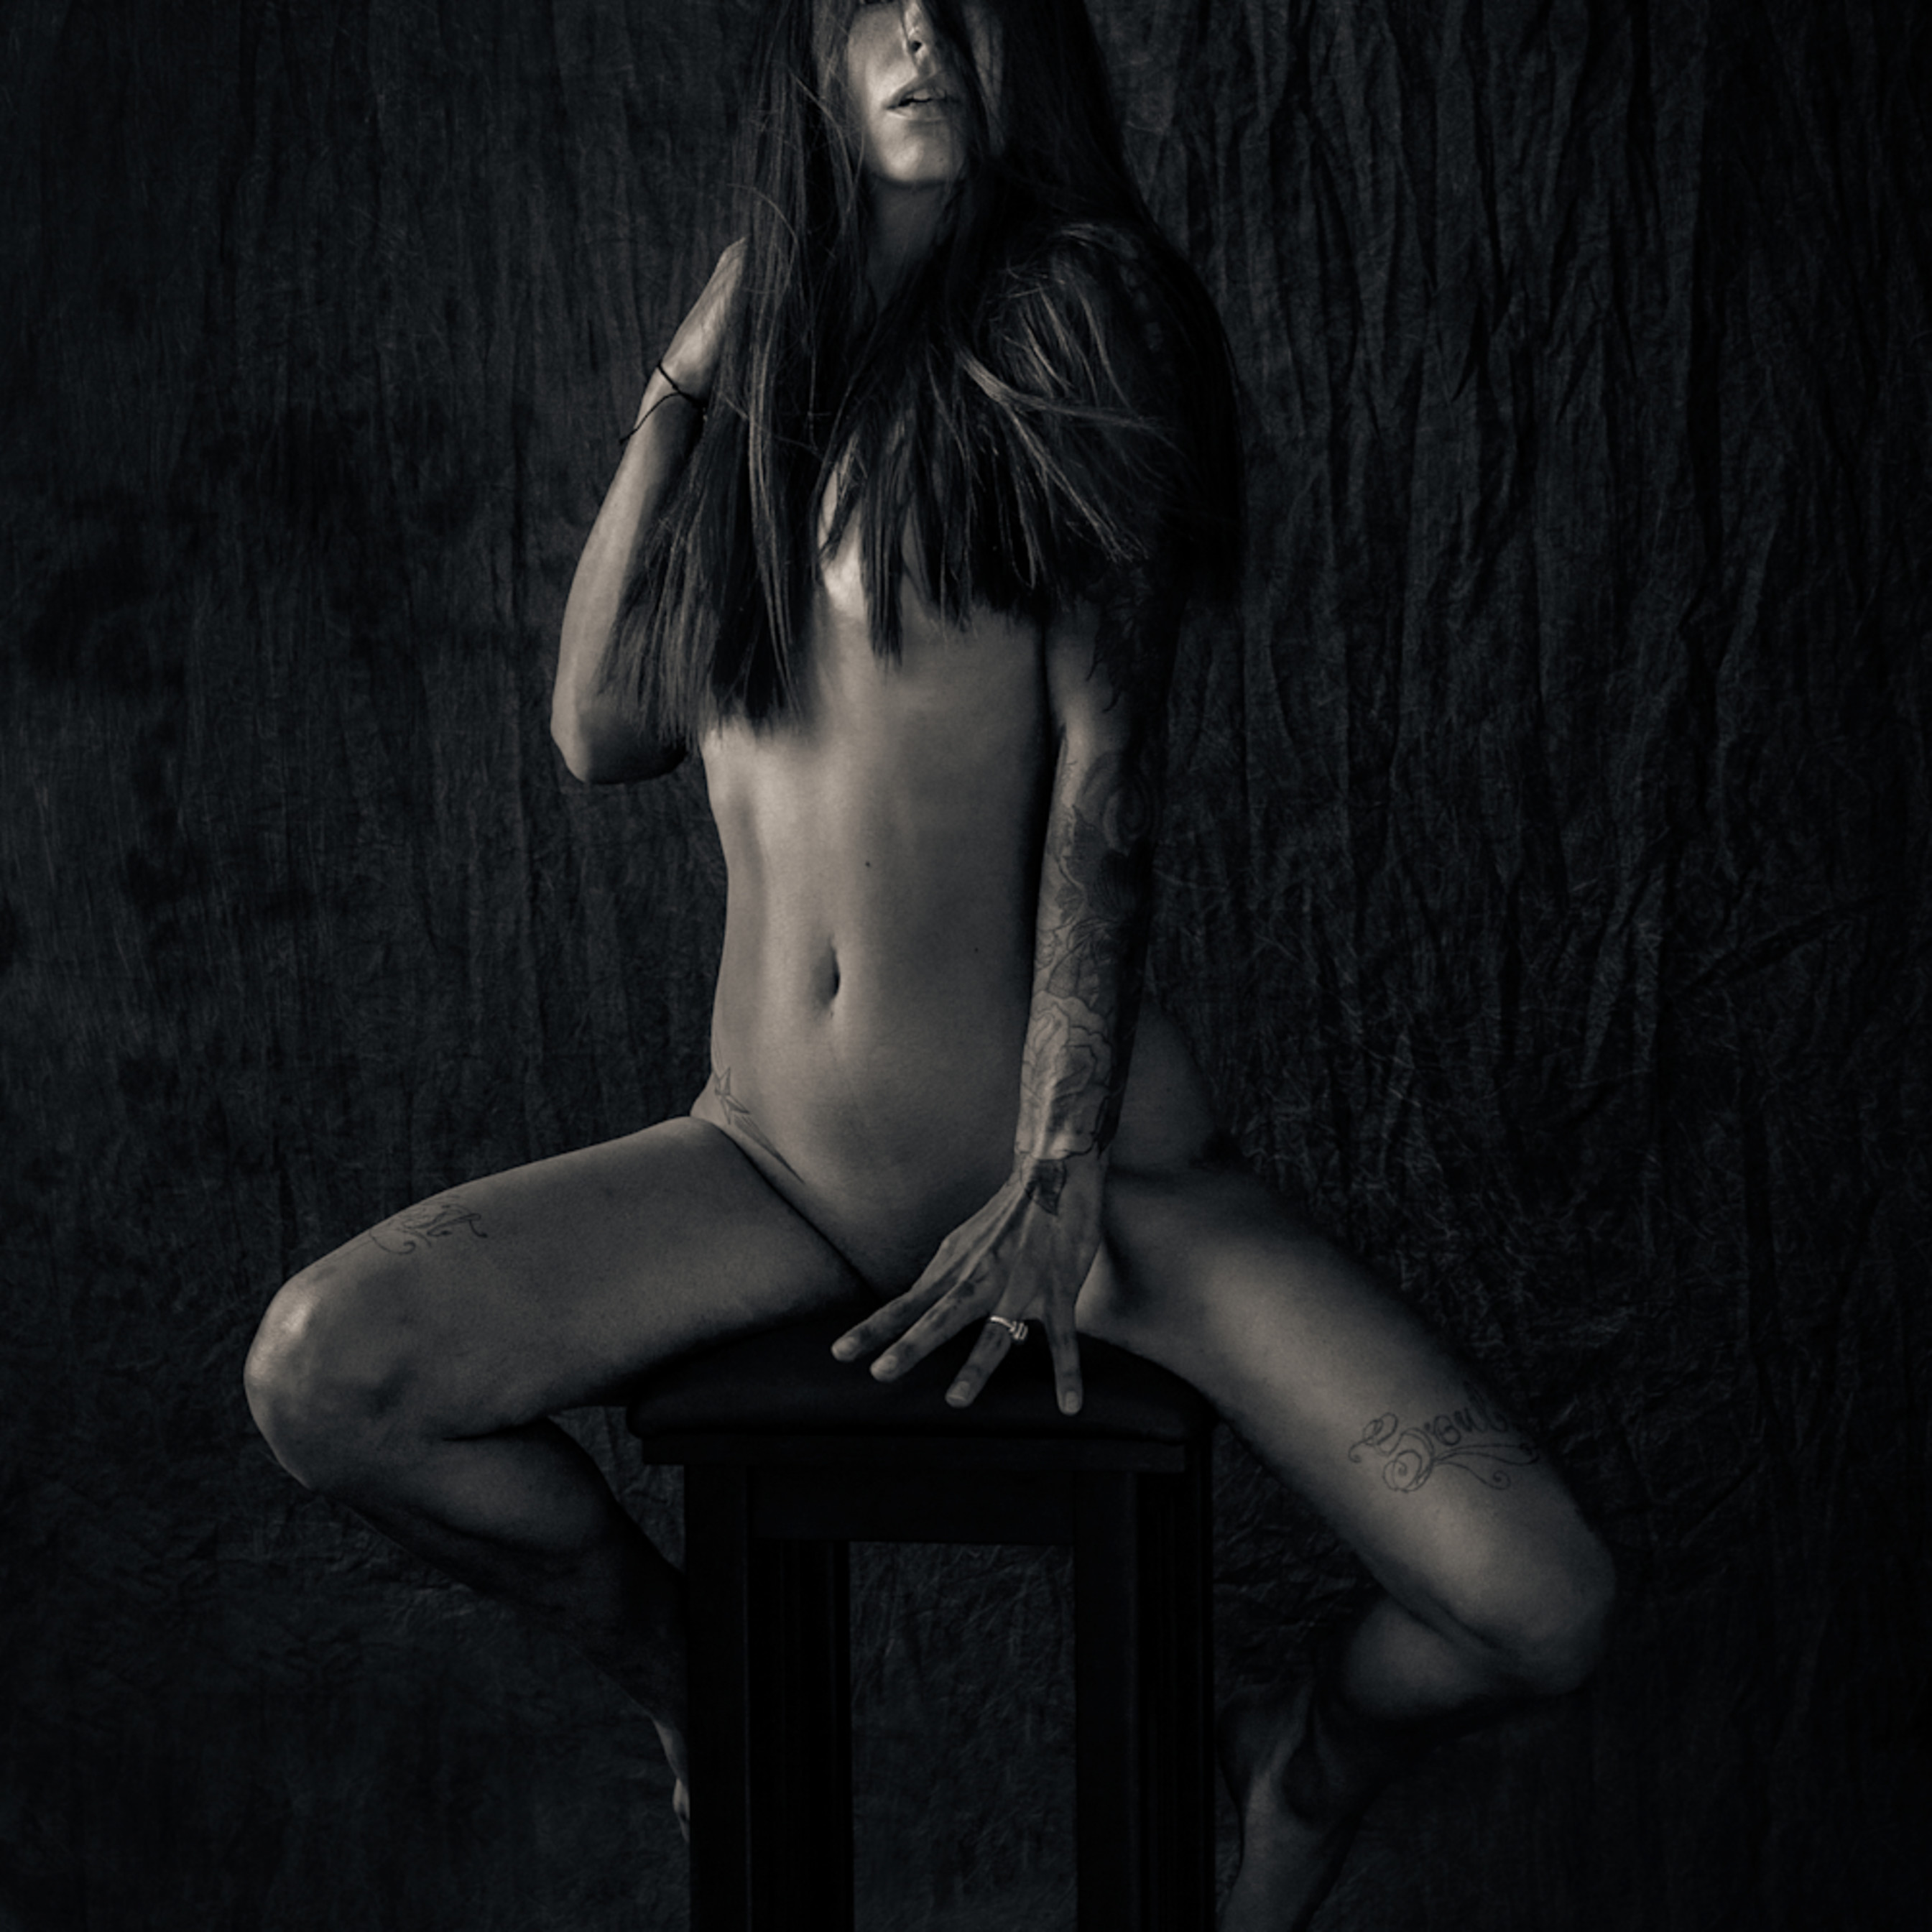 Portrait of hydee dbdgvy